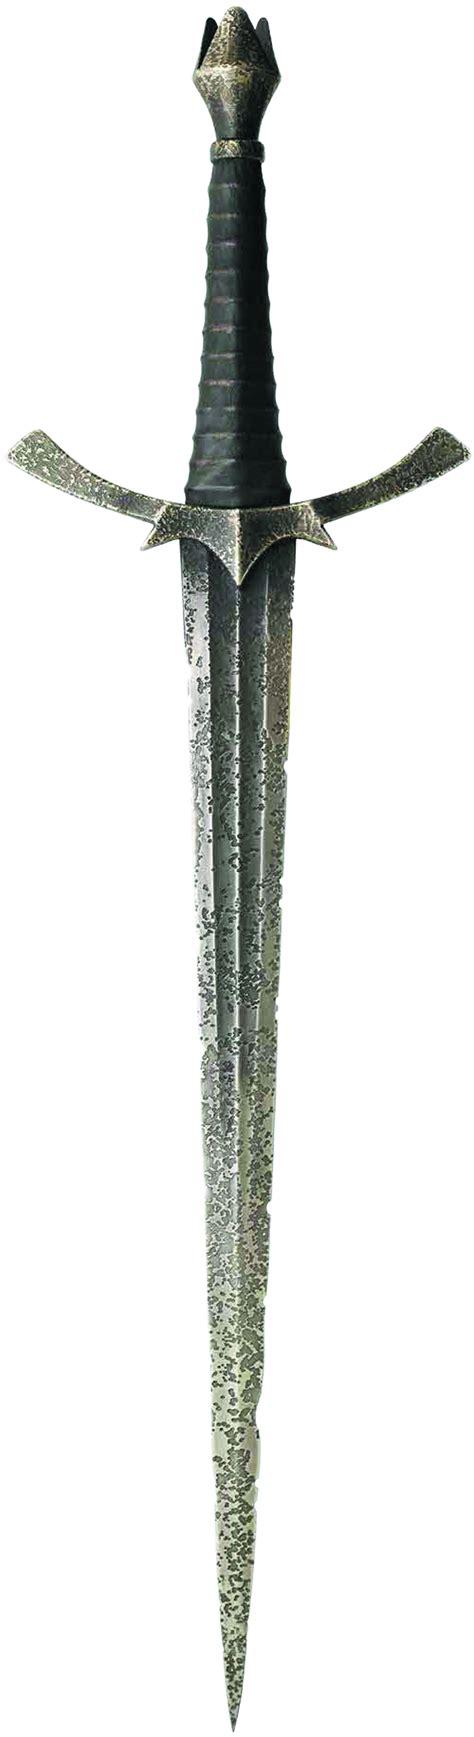 morgul blade previewsworld hobbit morgul blade sword replica c 1 1 2